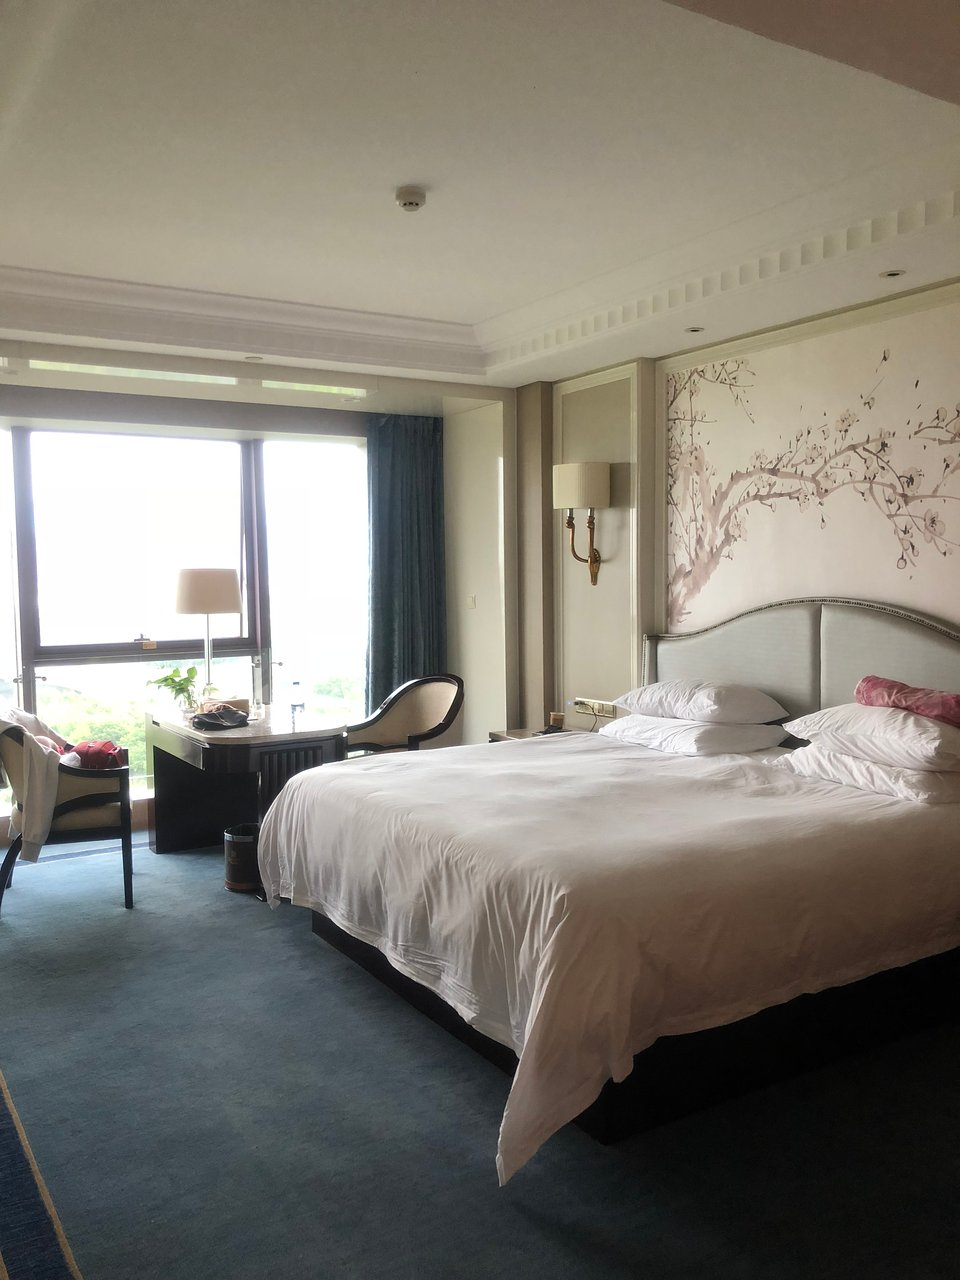 kasion hotel yiwu 51 8 5 updated 2019 prices reviews rh tripadvisor com